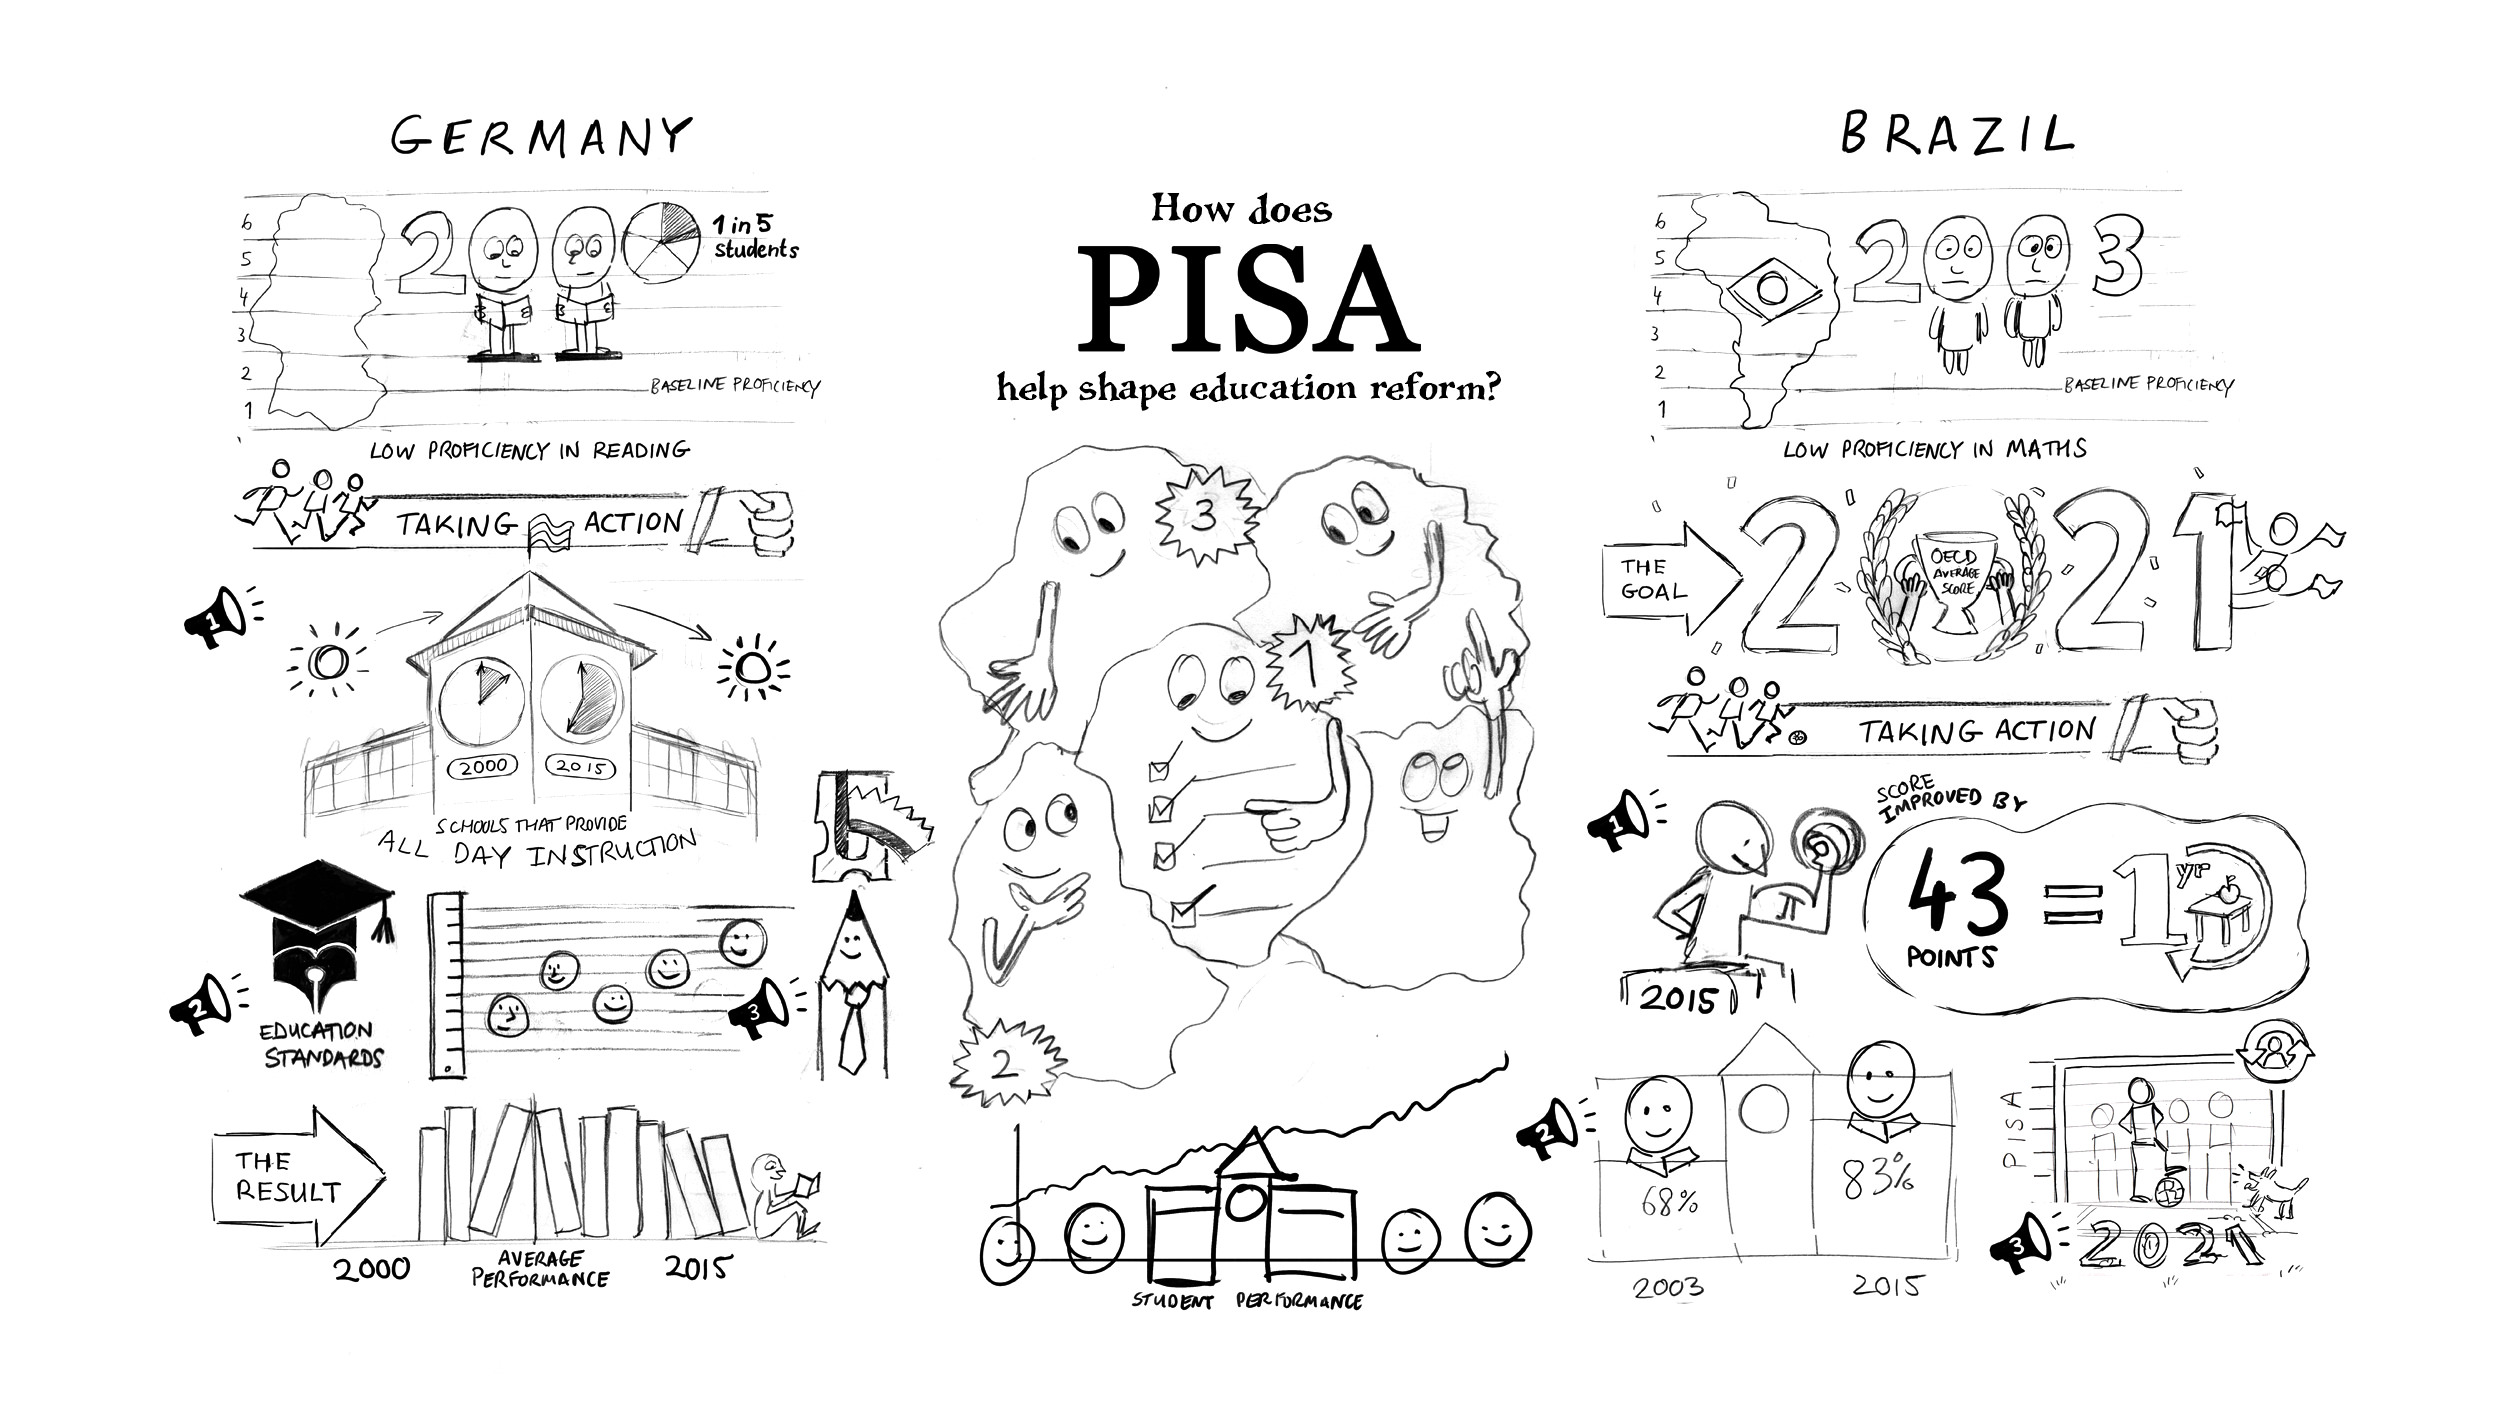 cognitive-oecd-pisa2-01-essential-message.jpg